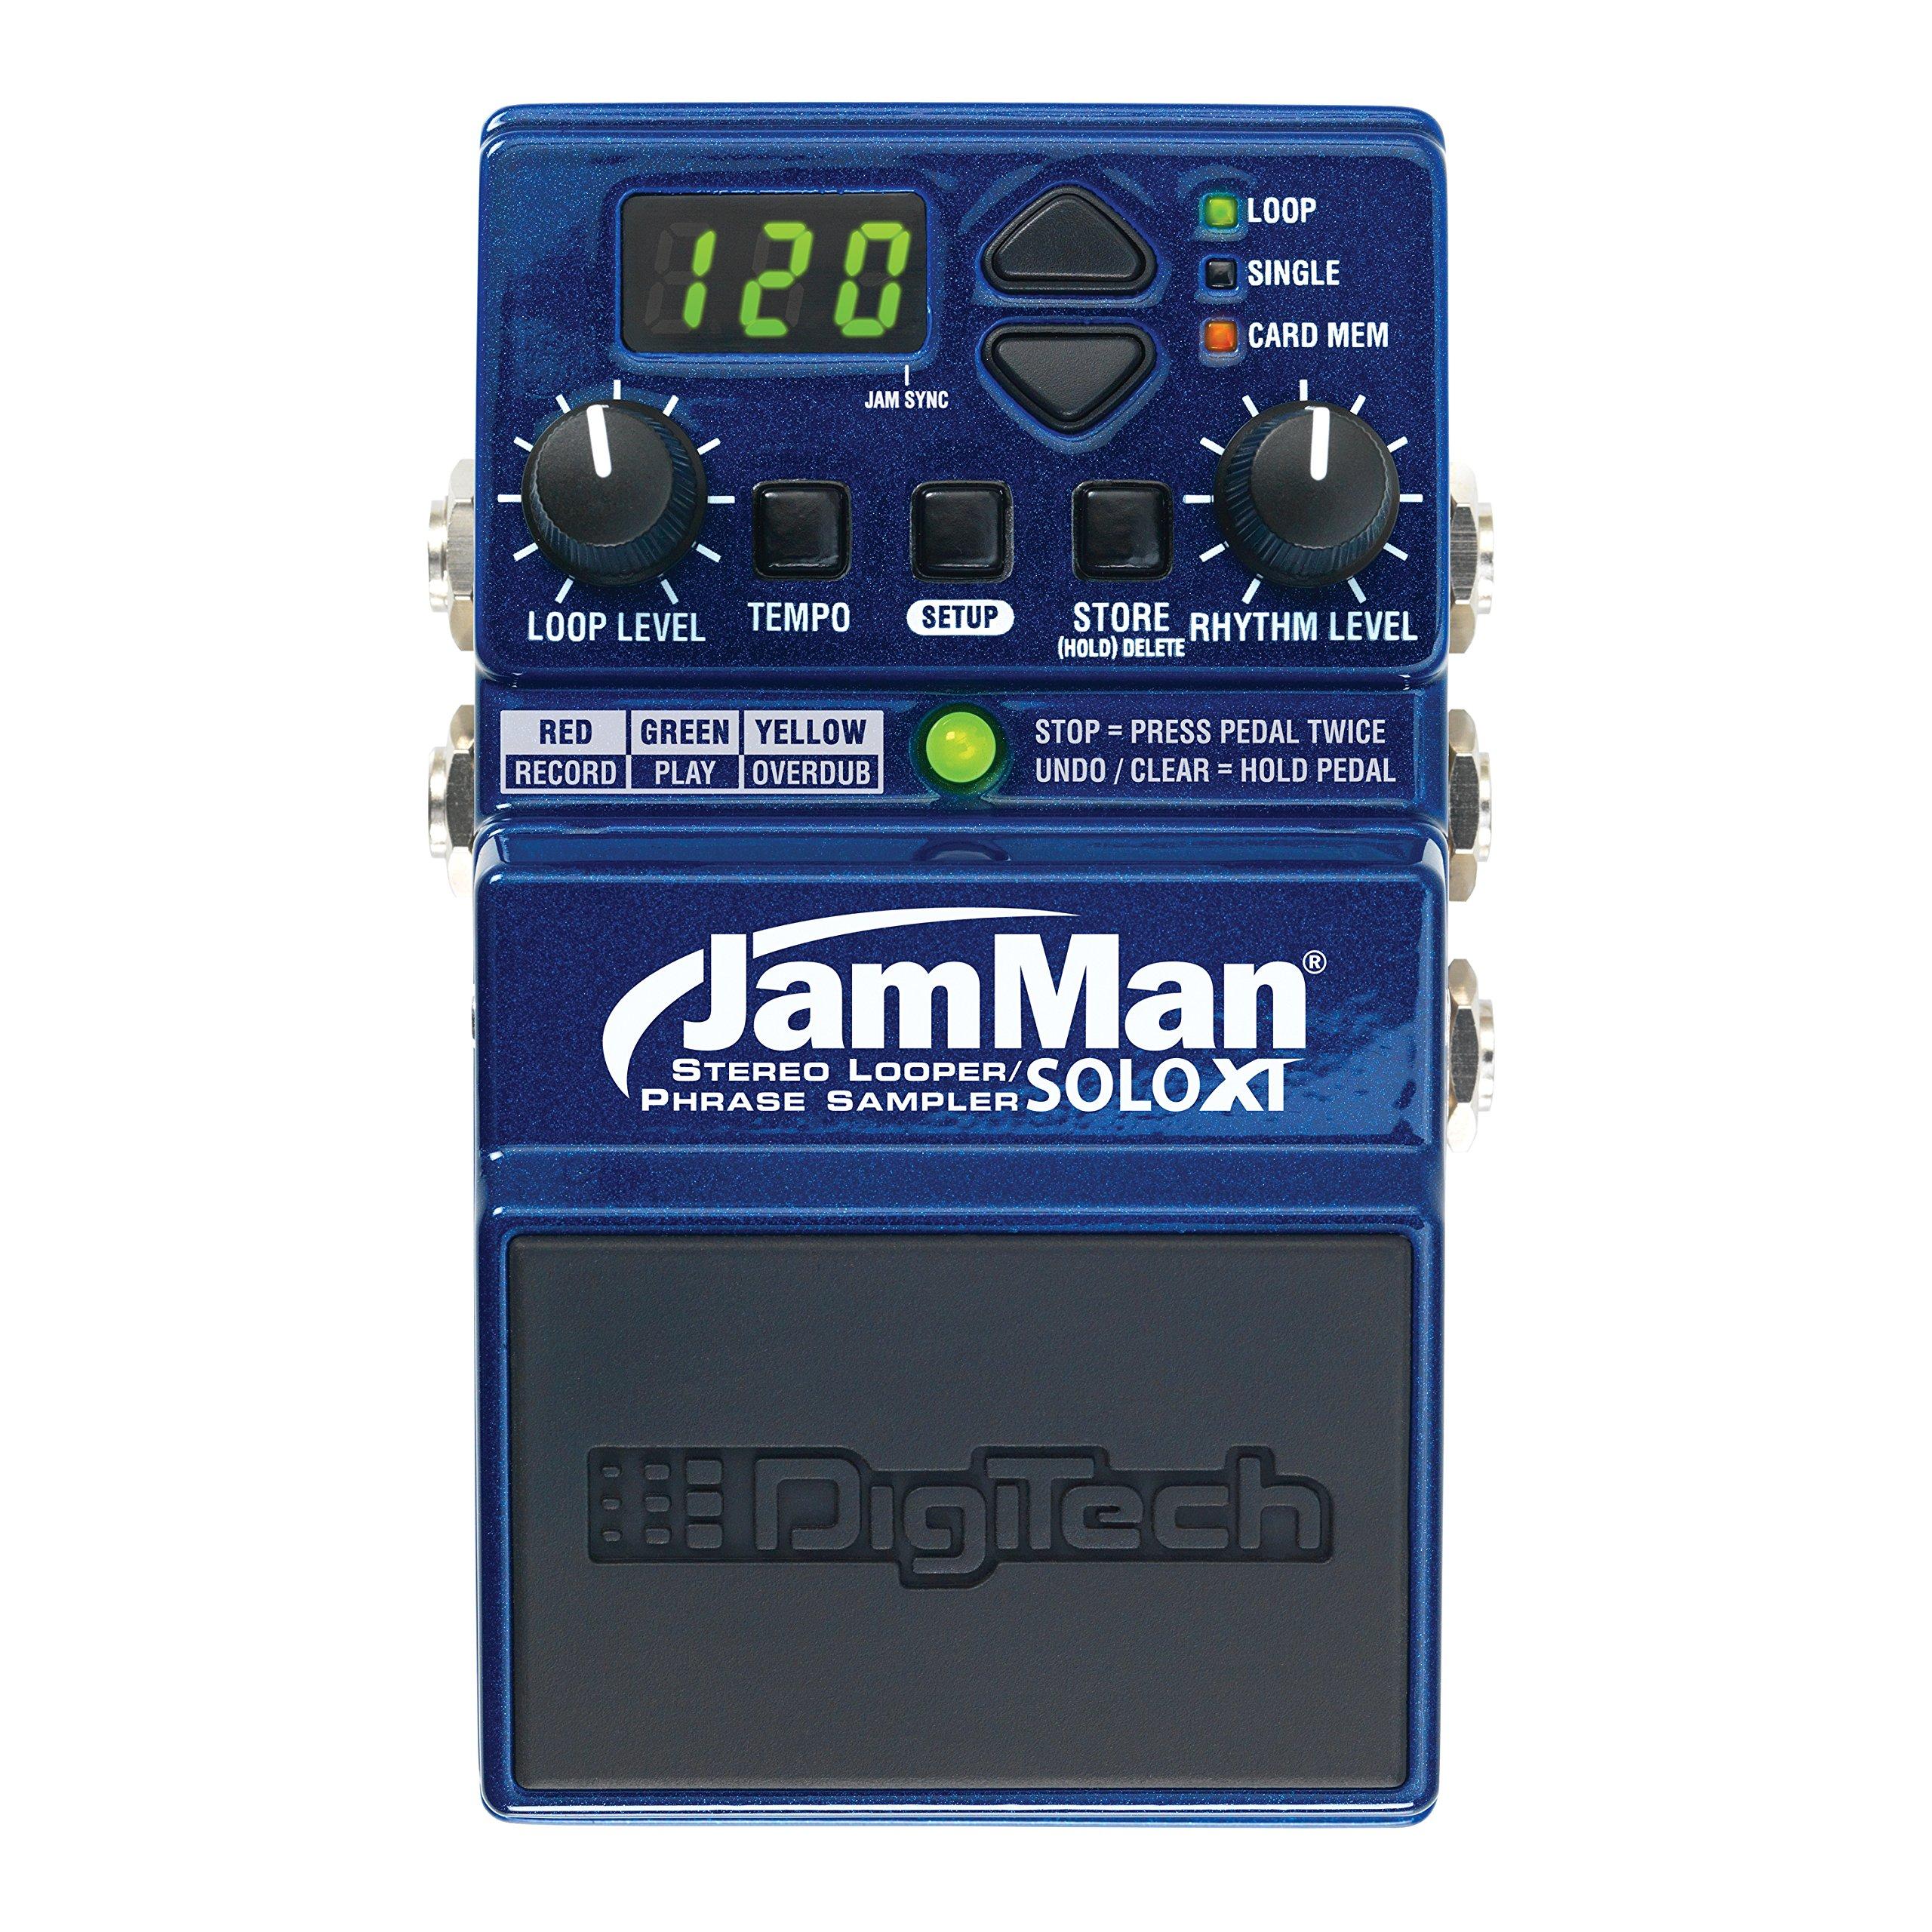 Digitech JMSXT Jamman Solo XT Stereo Looper Phrase Sampler Pedal by DigiTech